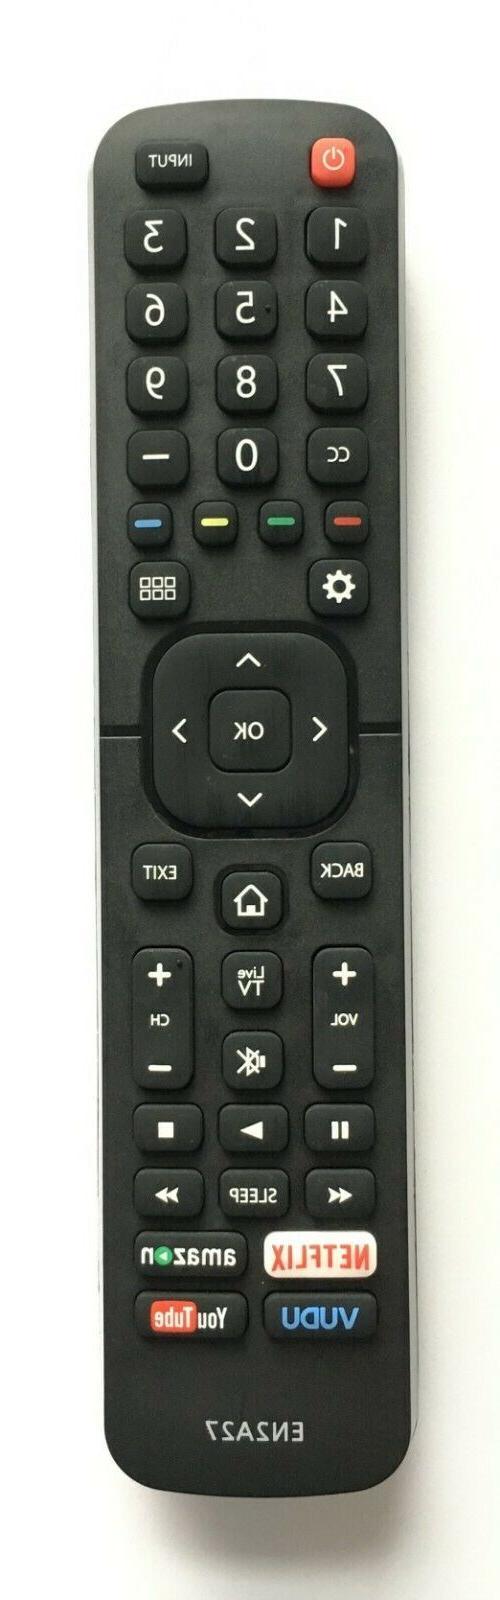 USBRMT New Hisense Remote EN2A27HT for Hisense Smart LED TV